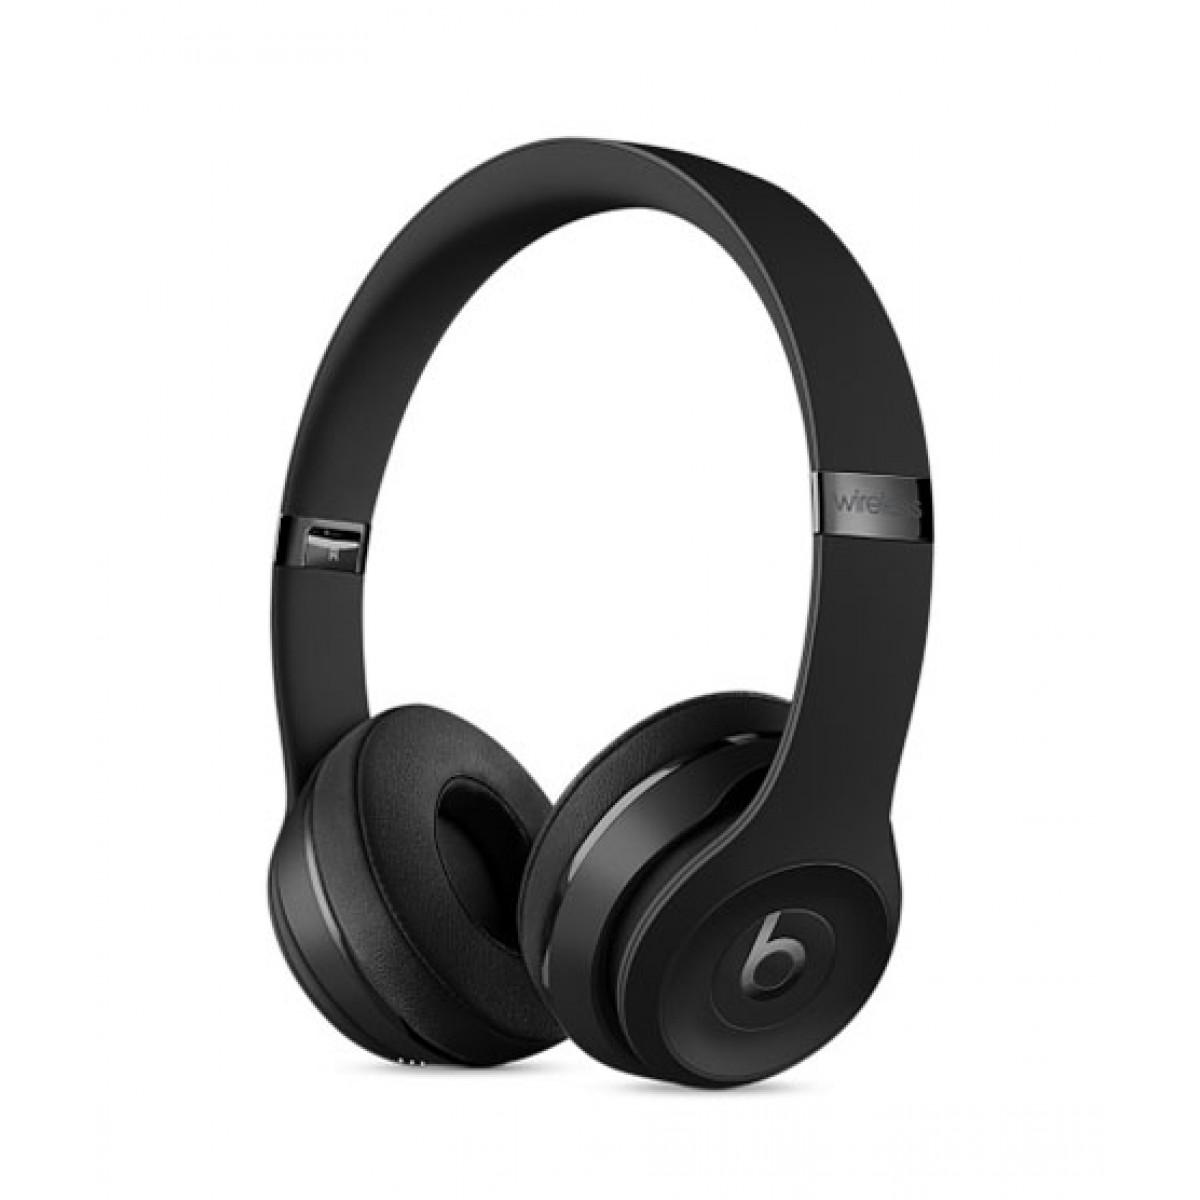 f8b4e144fa69 Beats Solo 3 Wireless On-Ear Headphones Price in Pakistan